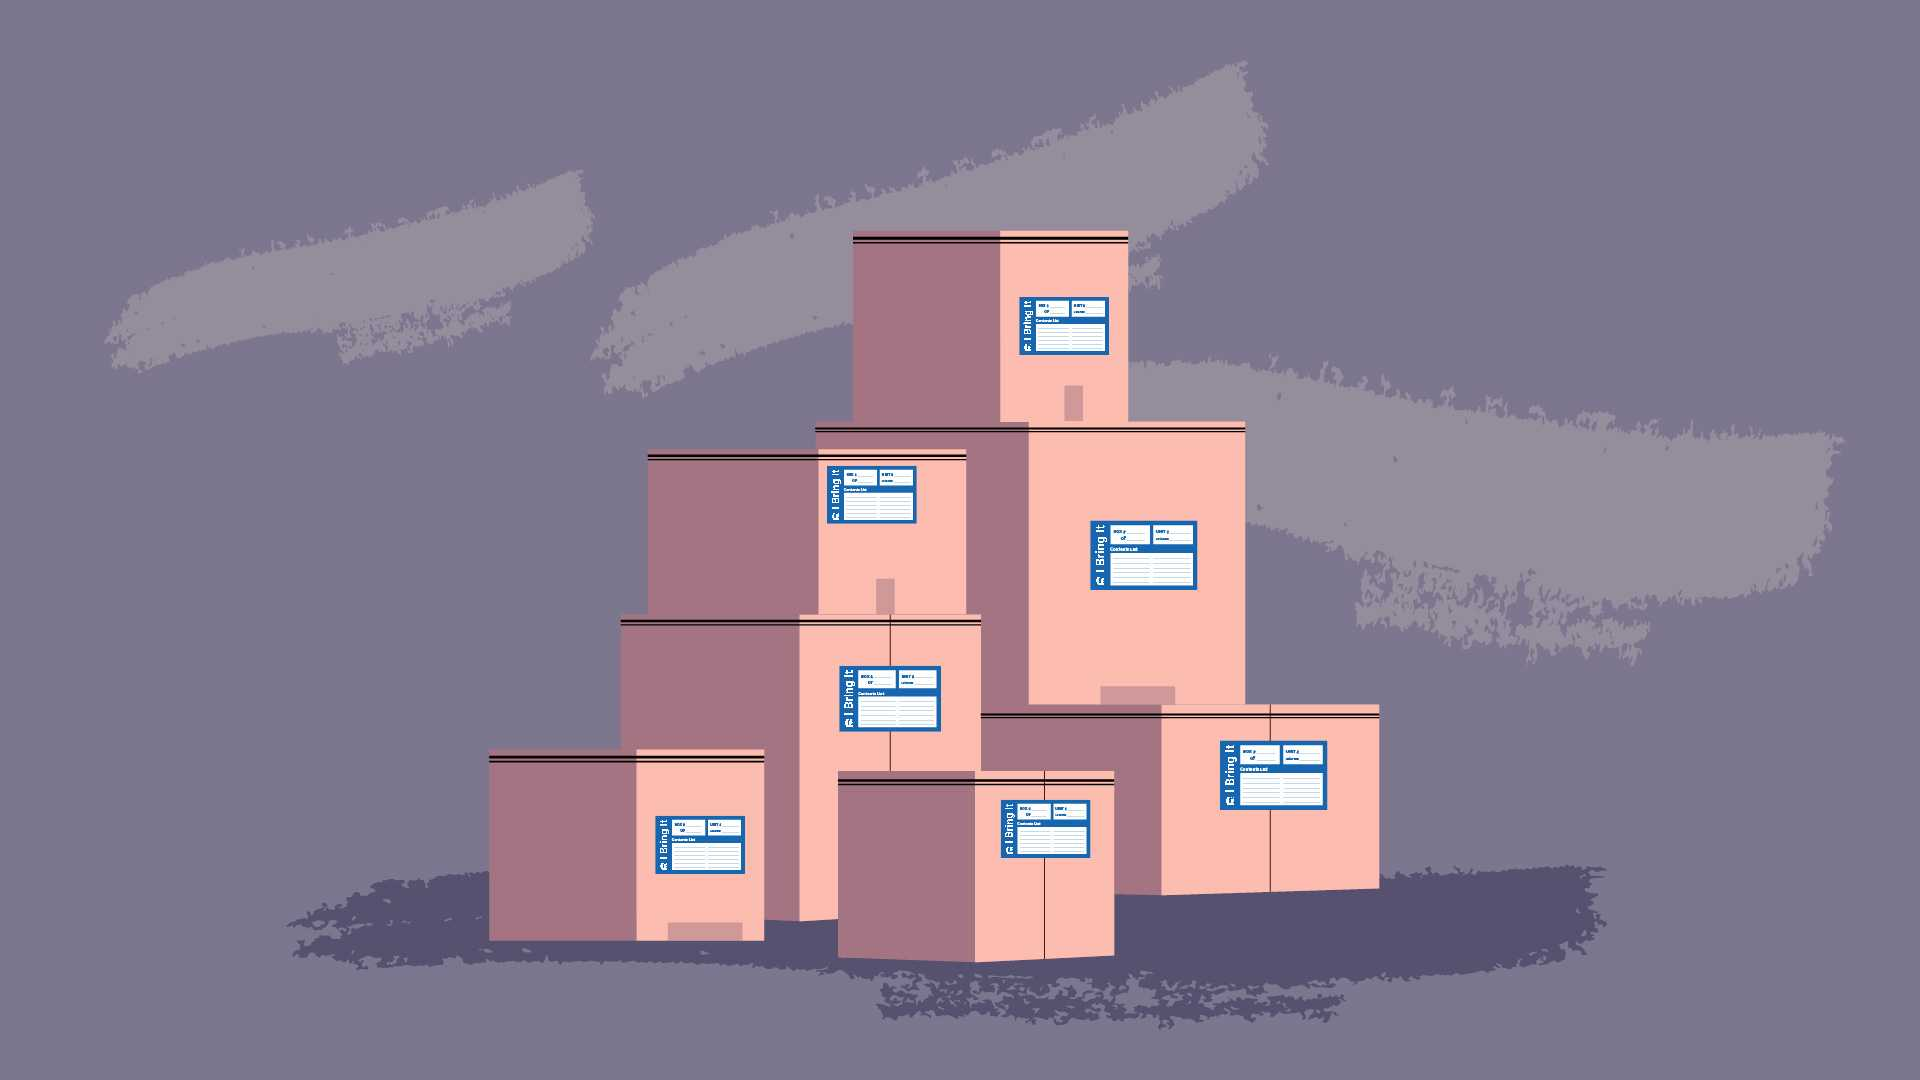 Folded boxes - Animated image of boxes